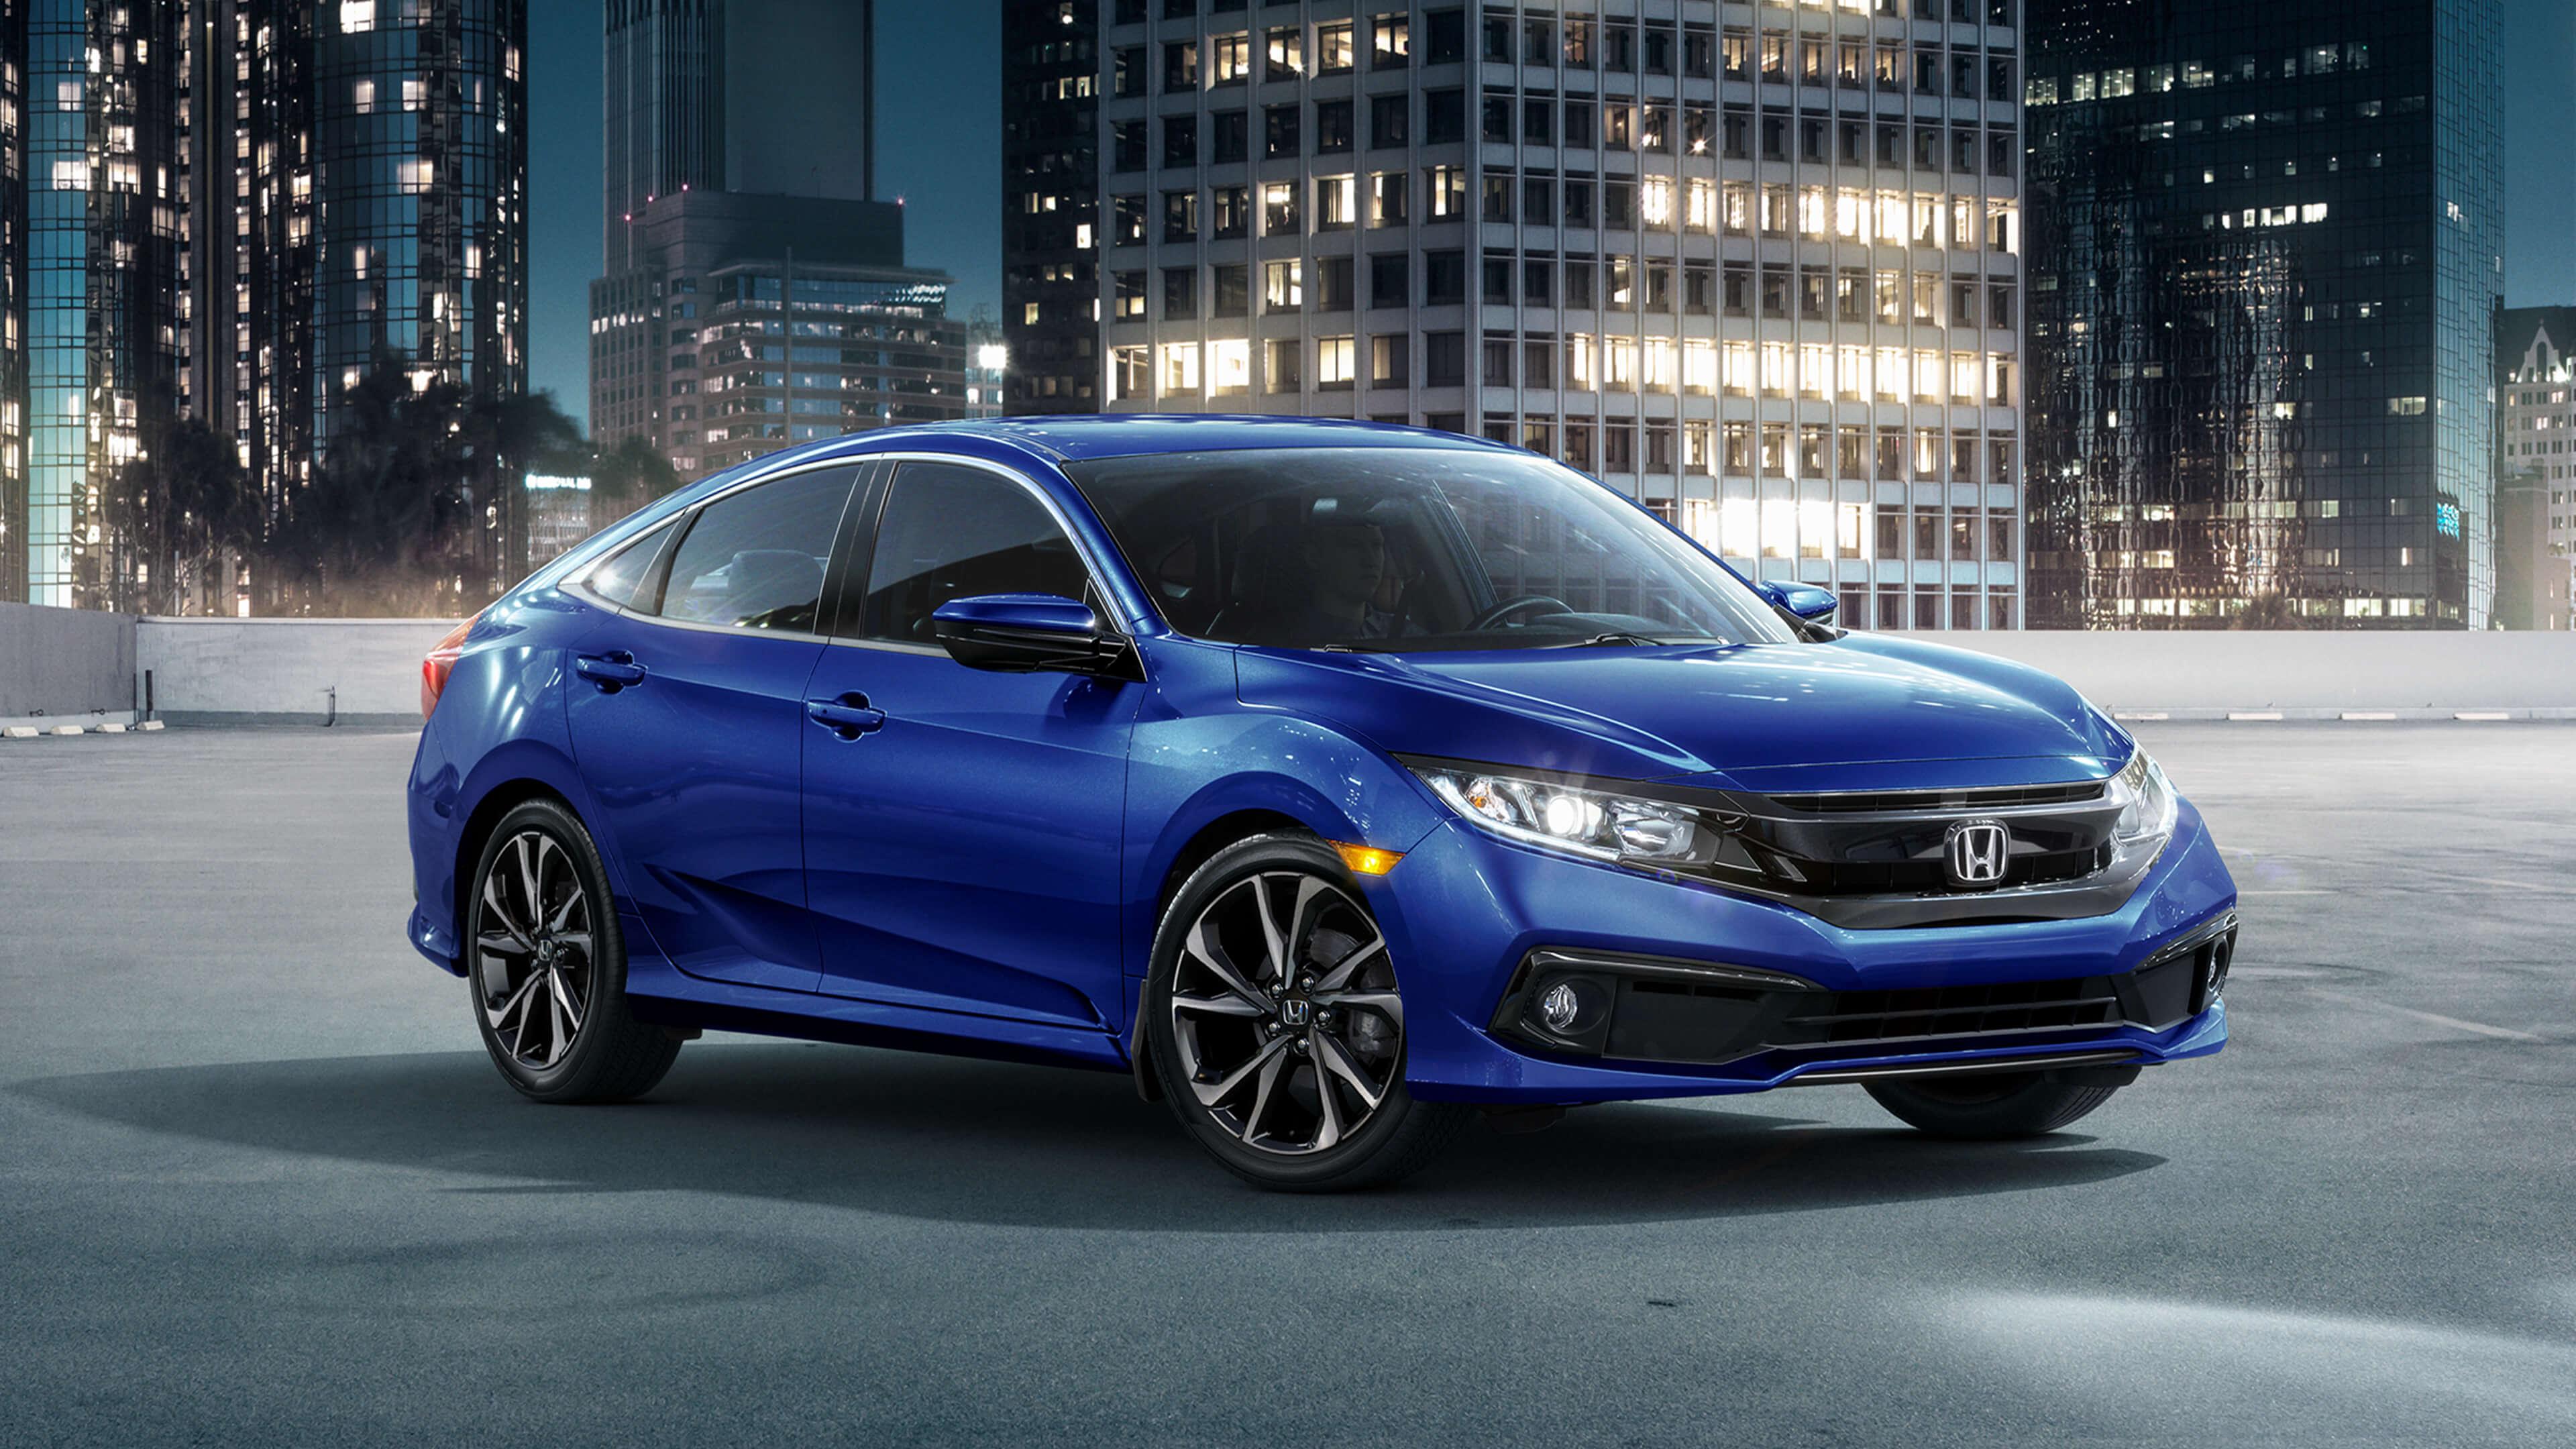 Honda Canada: Celebrates 50-Year Anniversary in 2019